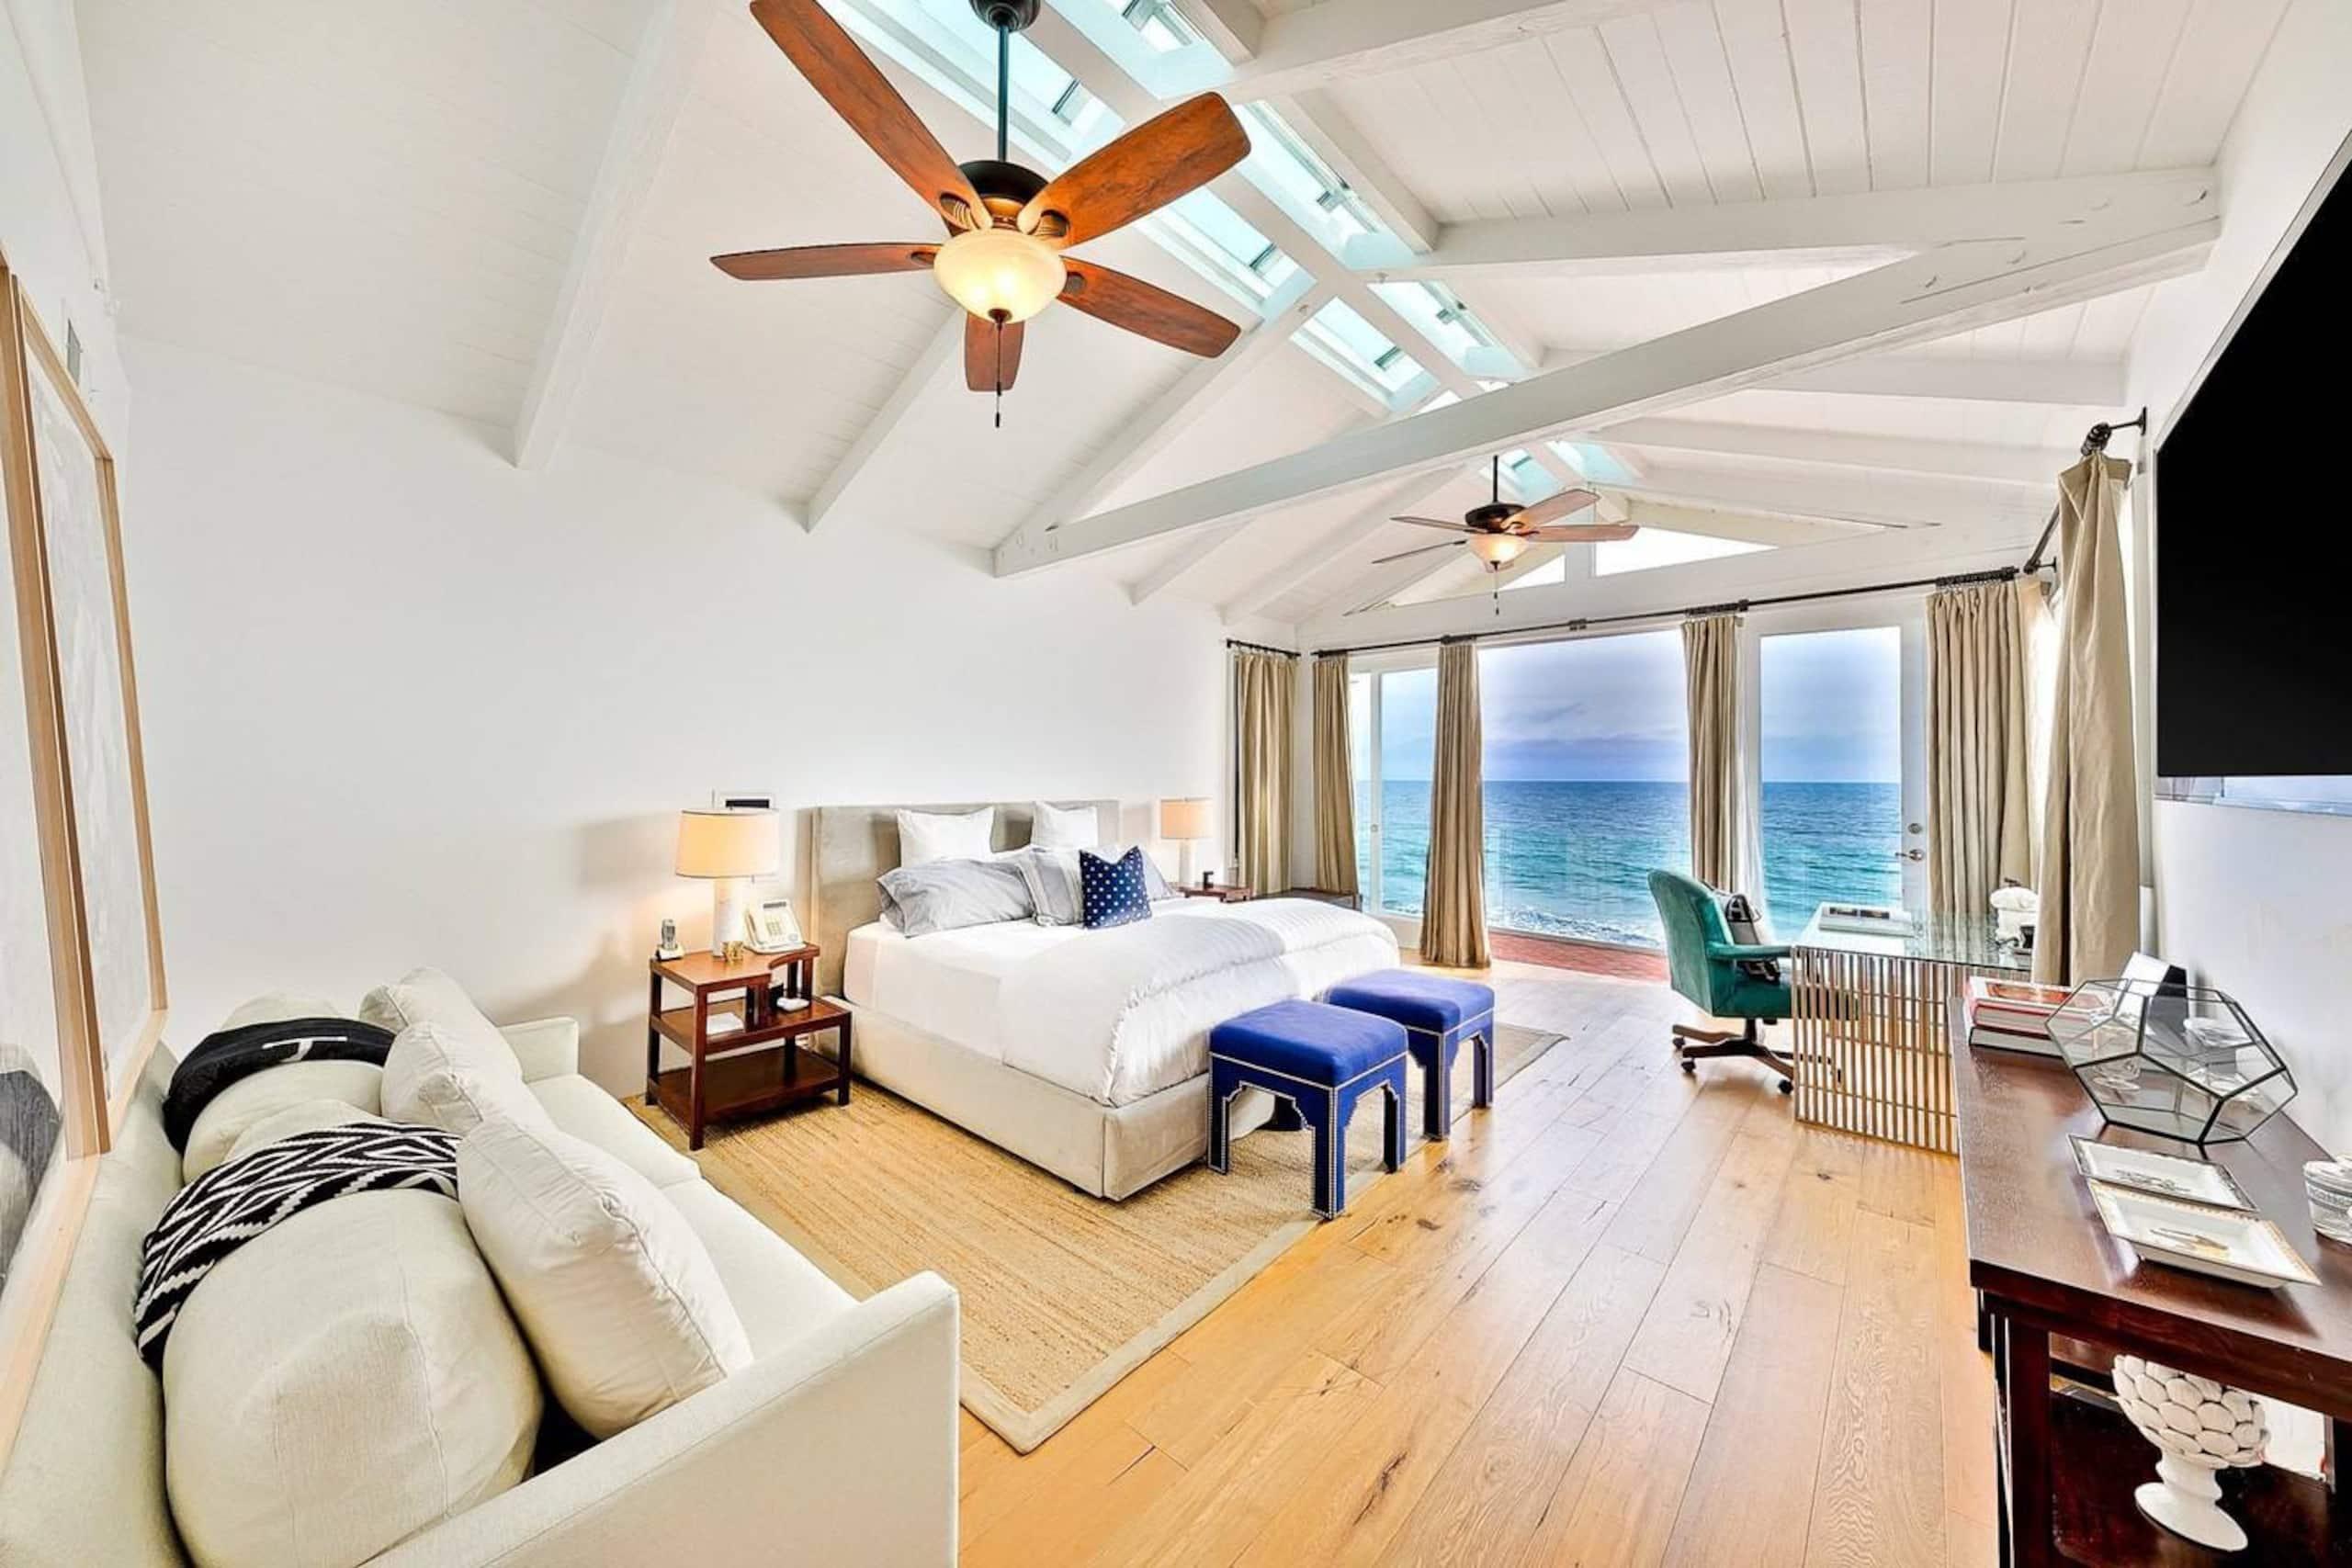 Apartment Villa Shawaiz - Beachfront Villa with 5 beds  photo 20246308